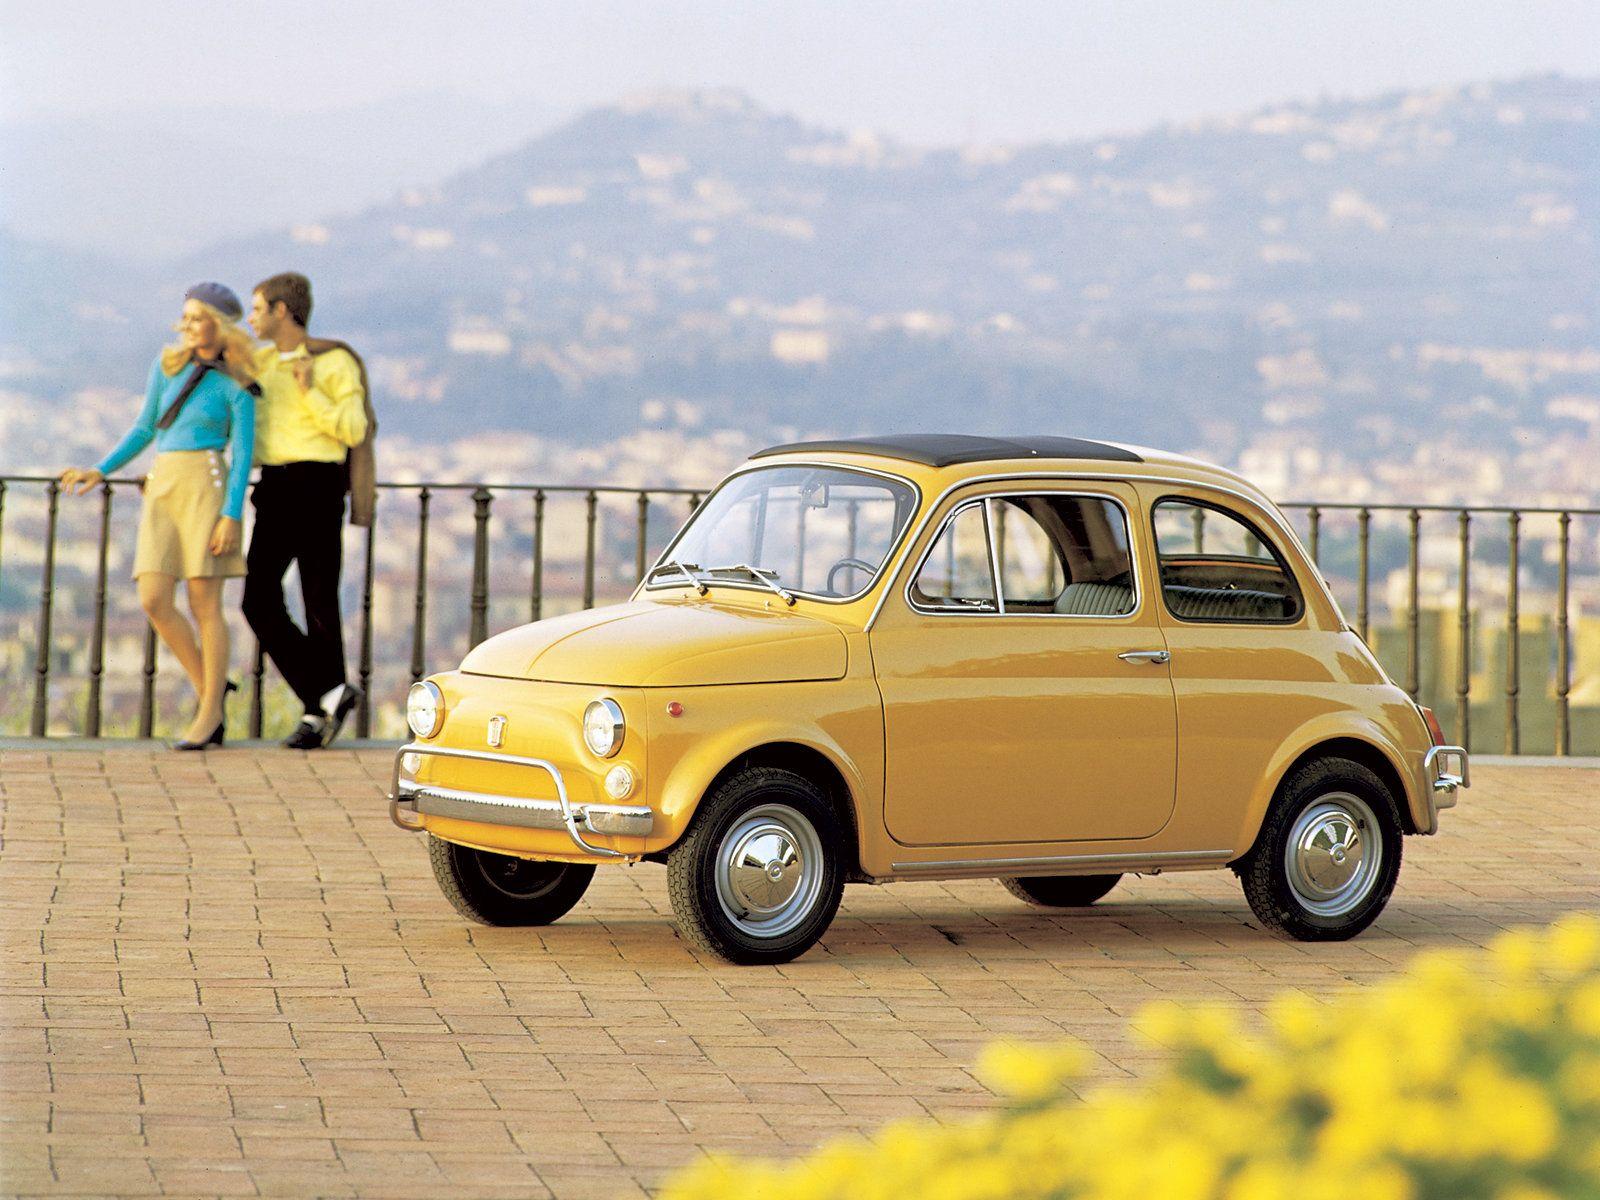 Fiat 500 1957 With Images Fiat 500 Vintage Fiat 500 Fiat Cars